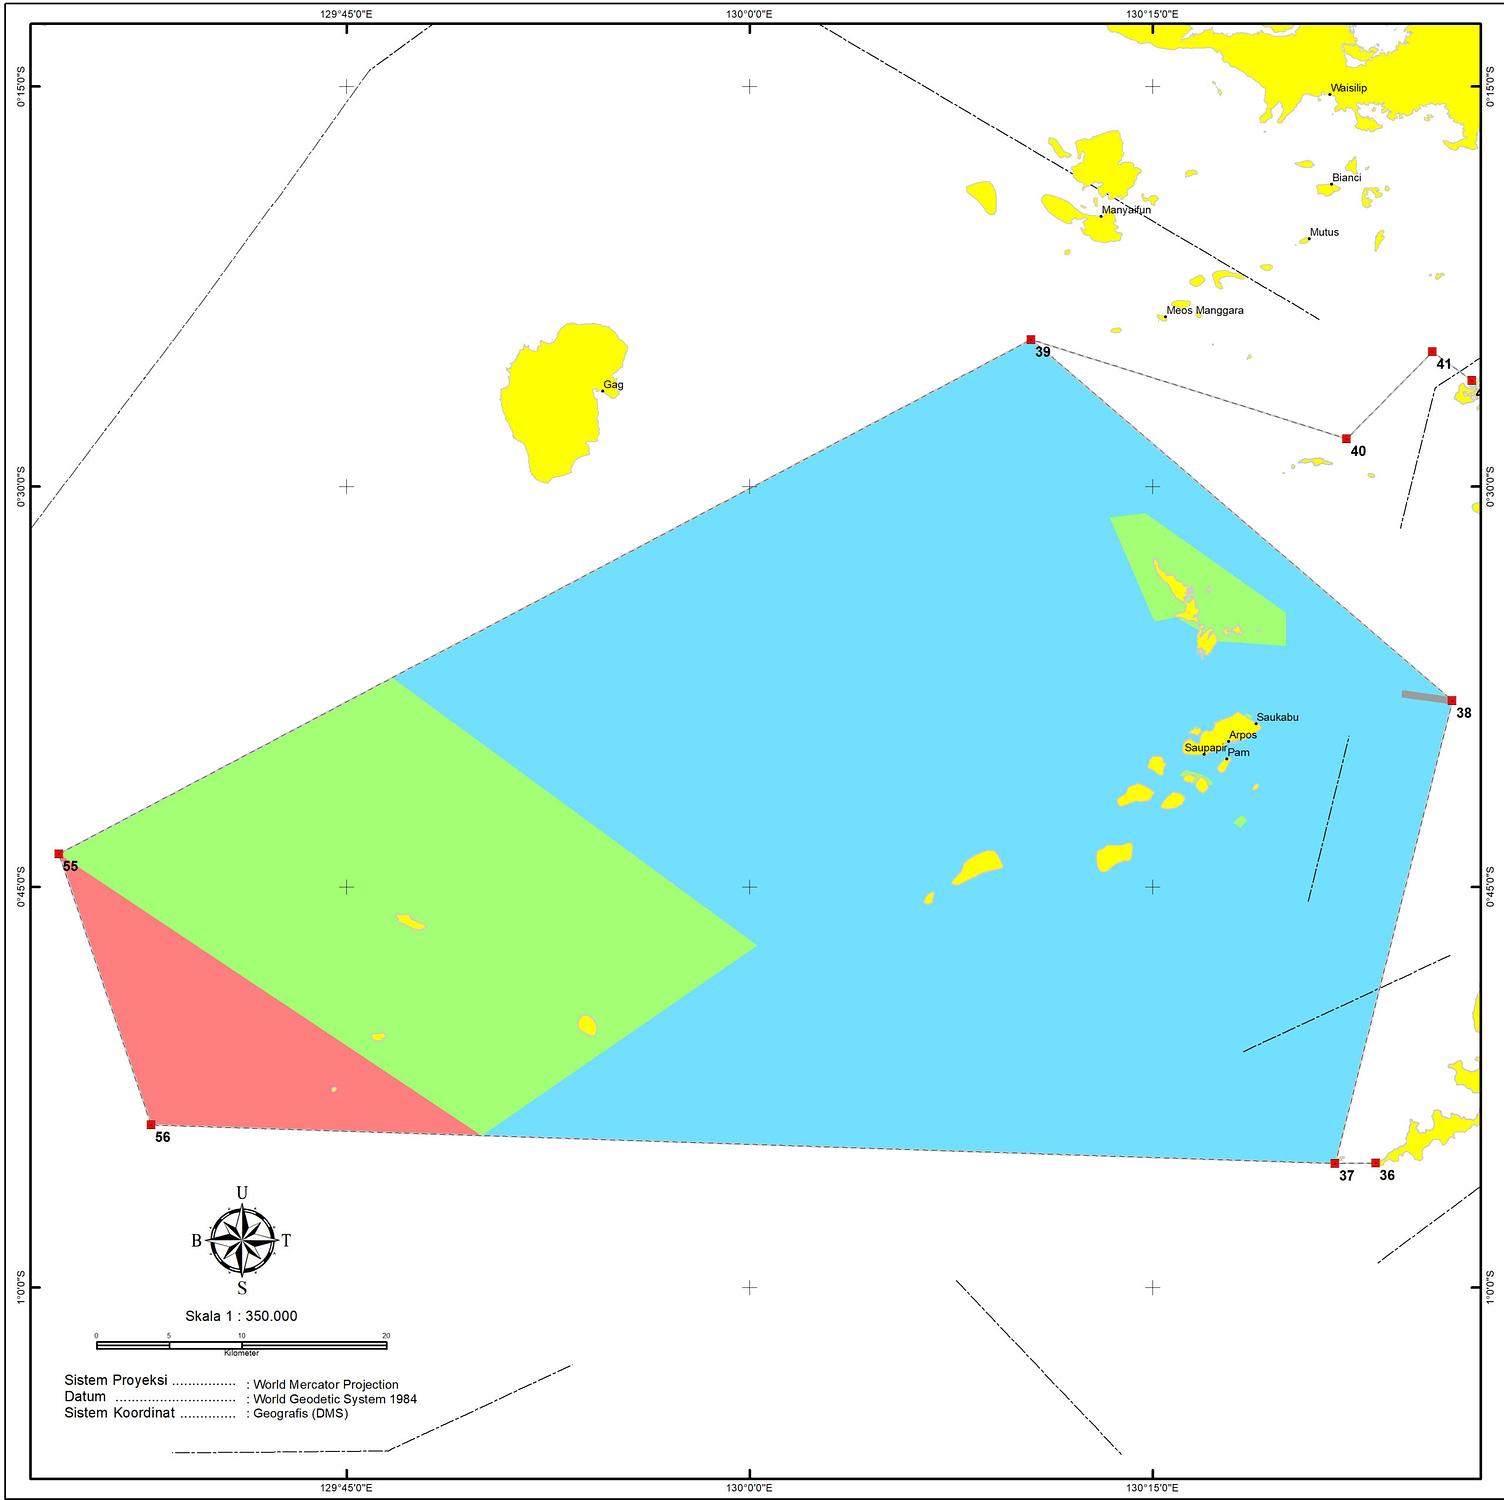 Zoning Fam Islands MPA Raja Ampat Marine Park